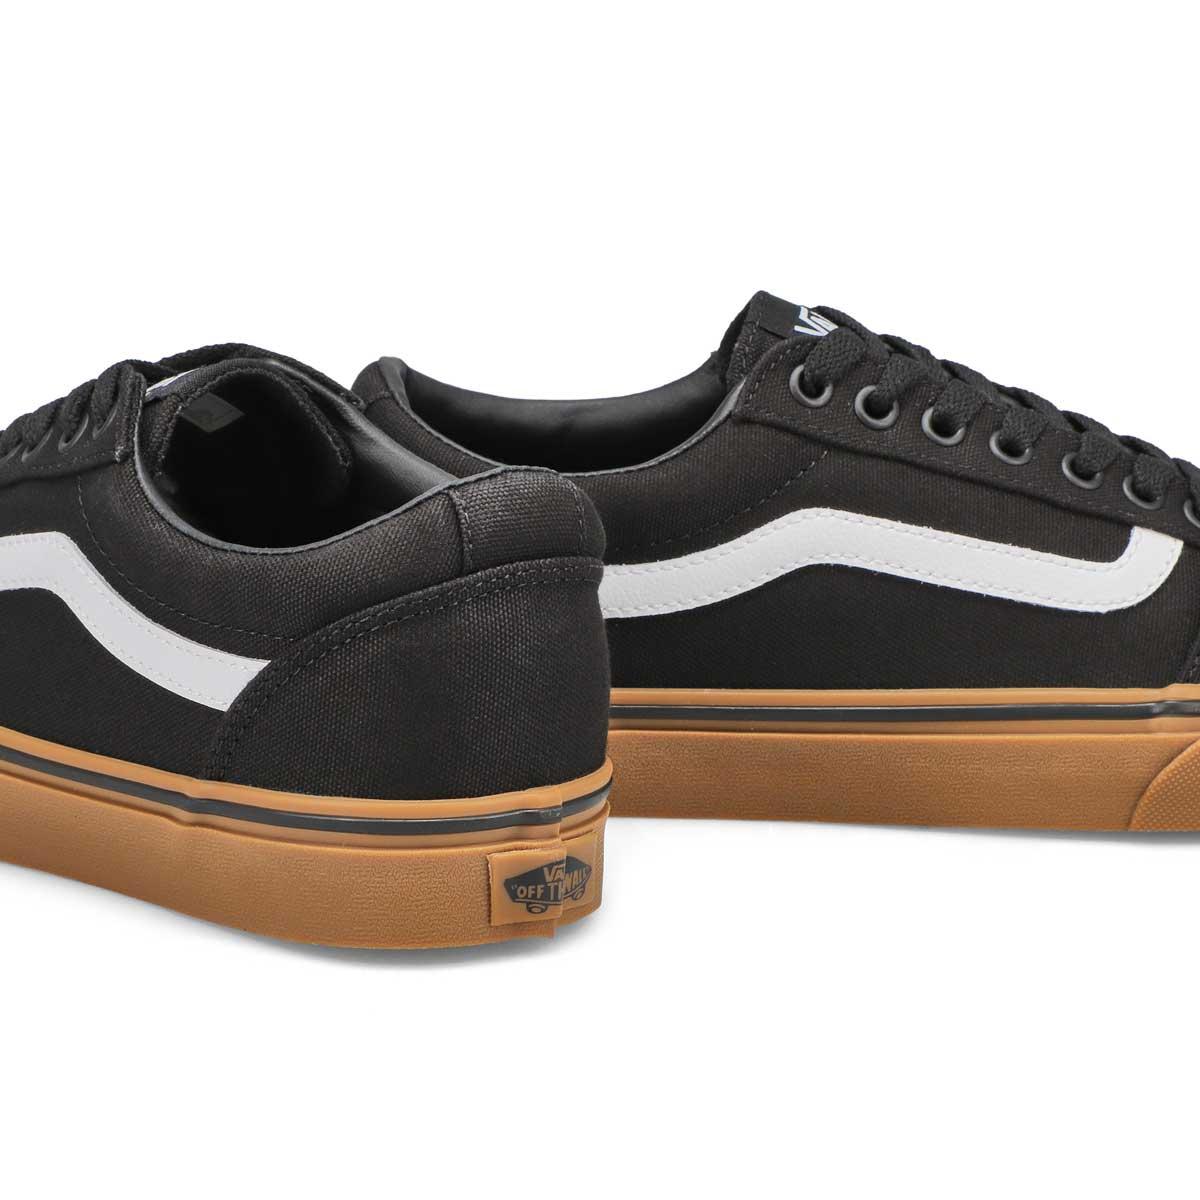 Men's Ward Sneaker - Black/Gum